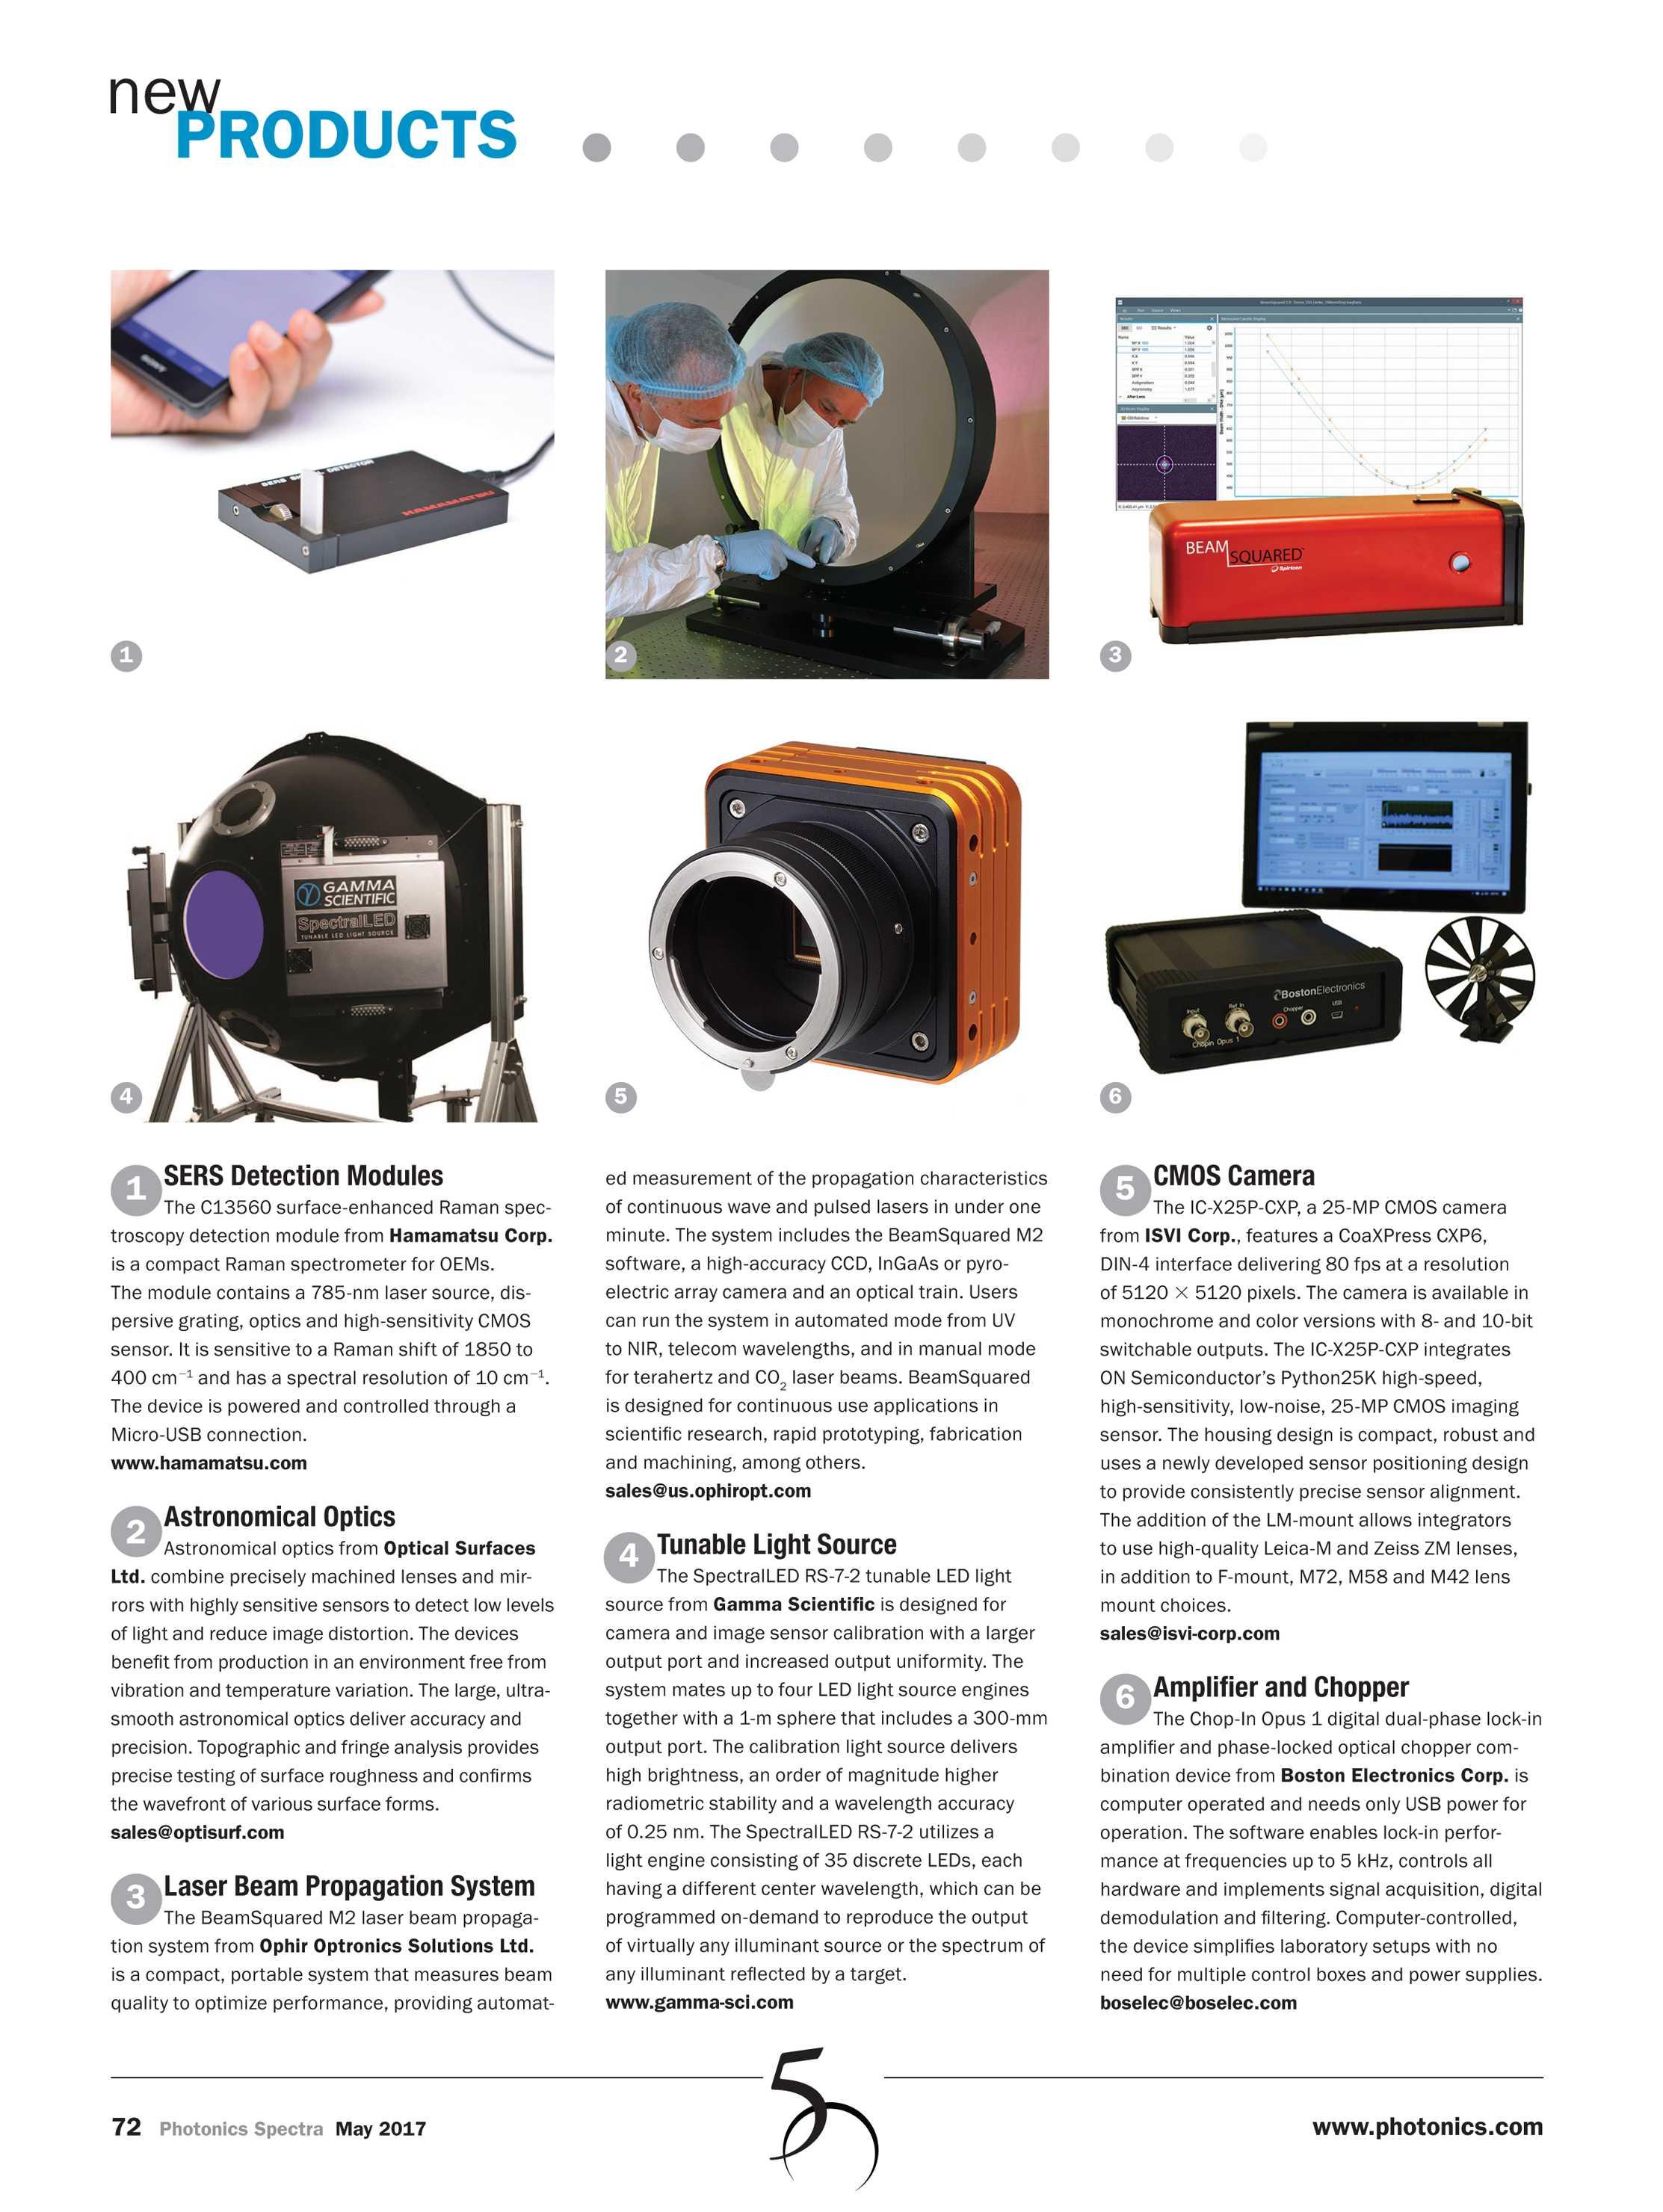 Photonics Spectra - May 2017 - page 72